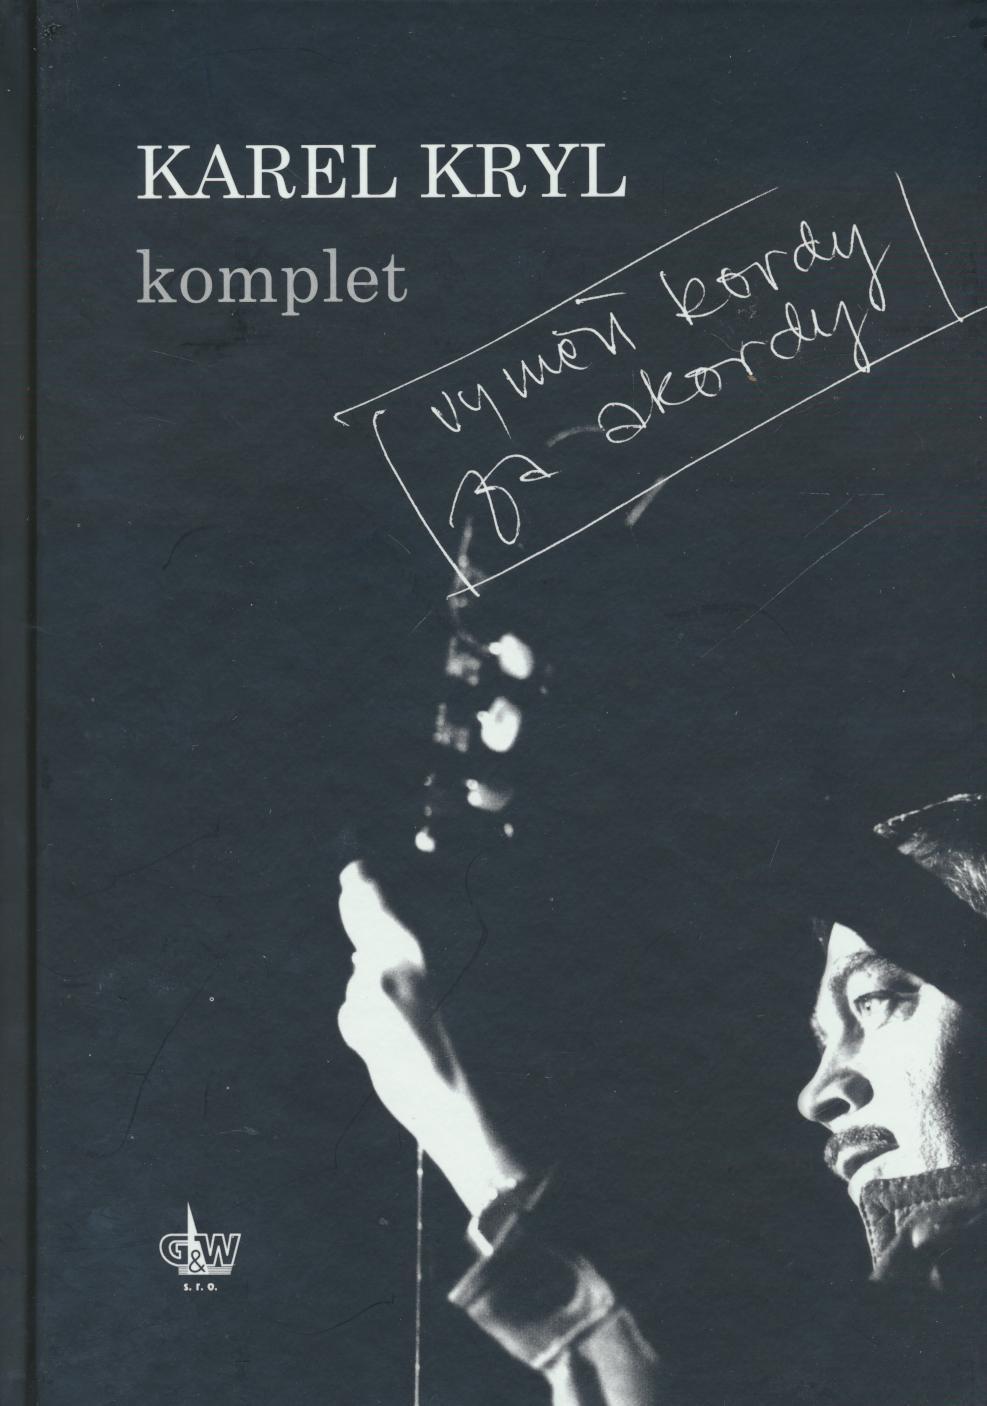 ZPEVNIK KOMPLET Karel Kryl [150 písní] - suprshop.cz